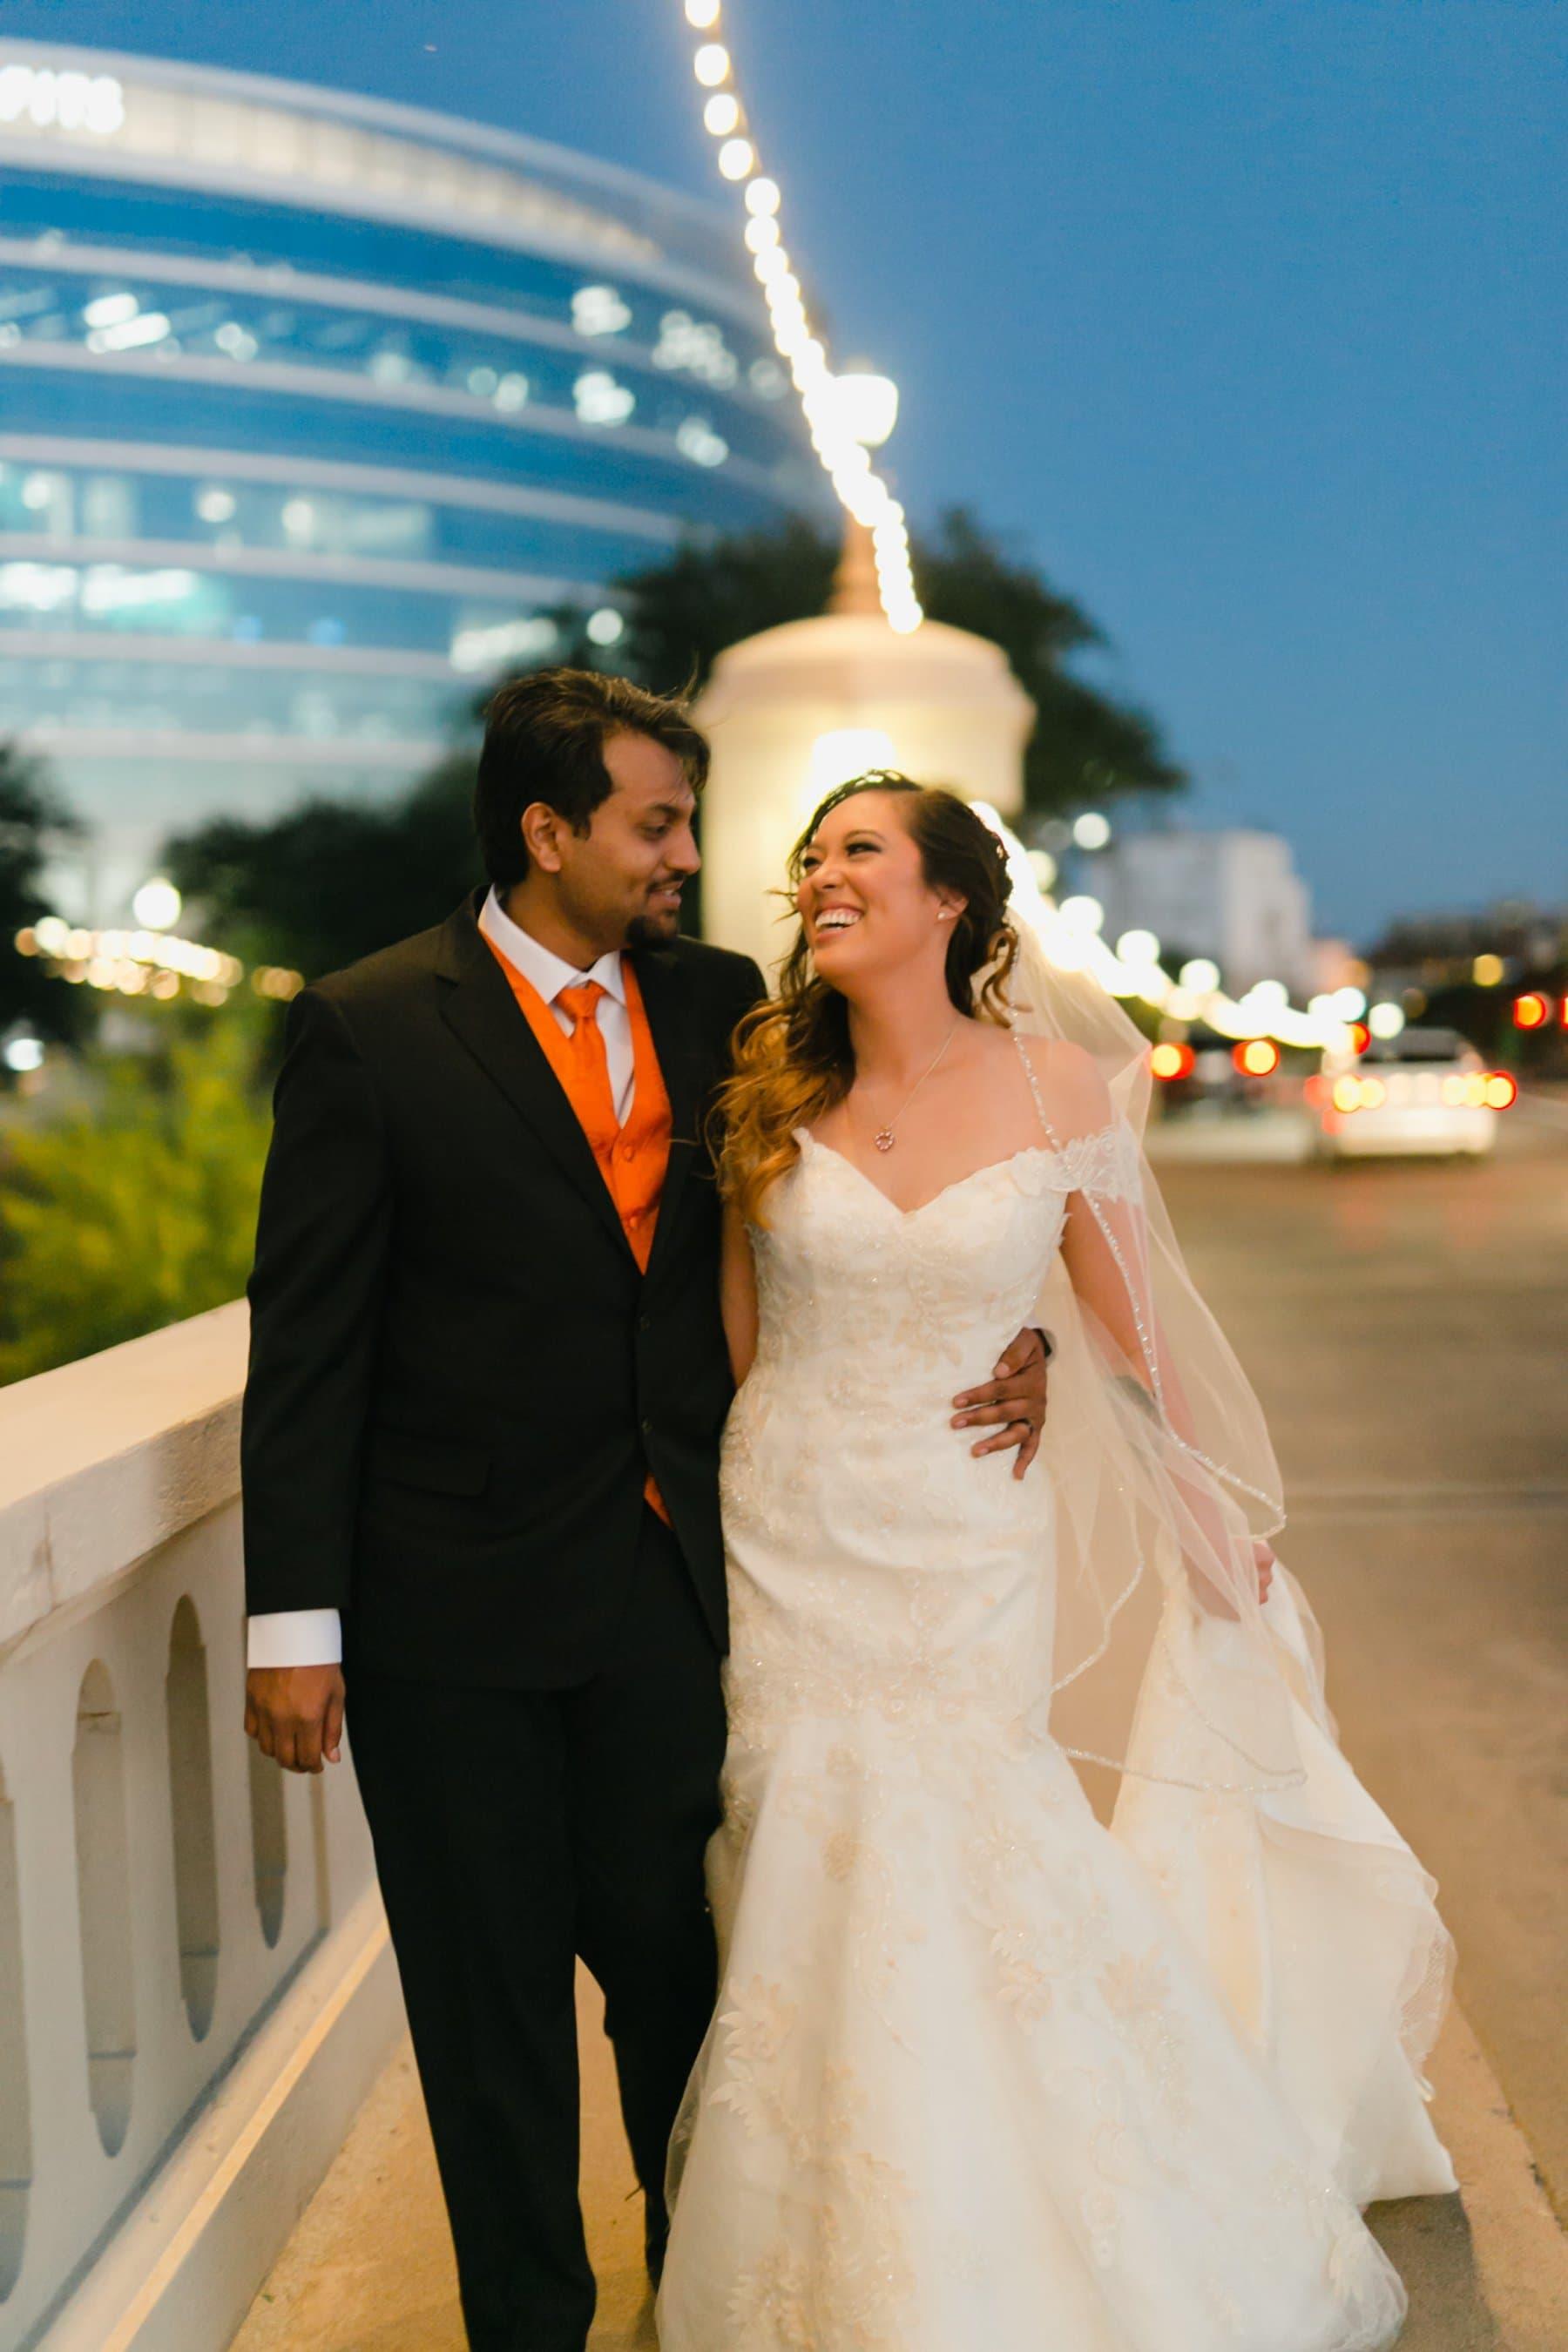 natural candid laughing bride & groom on Tempe Town Lake bridge